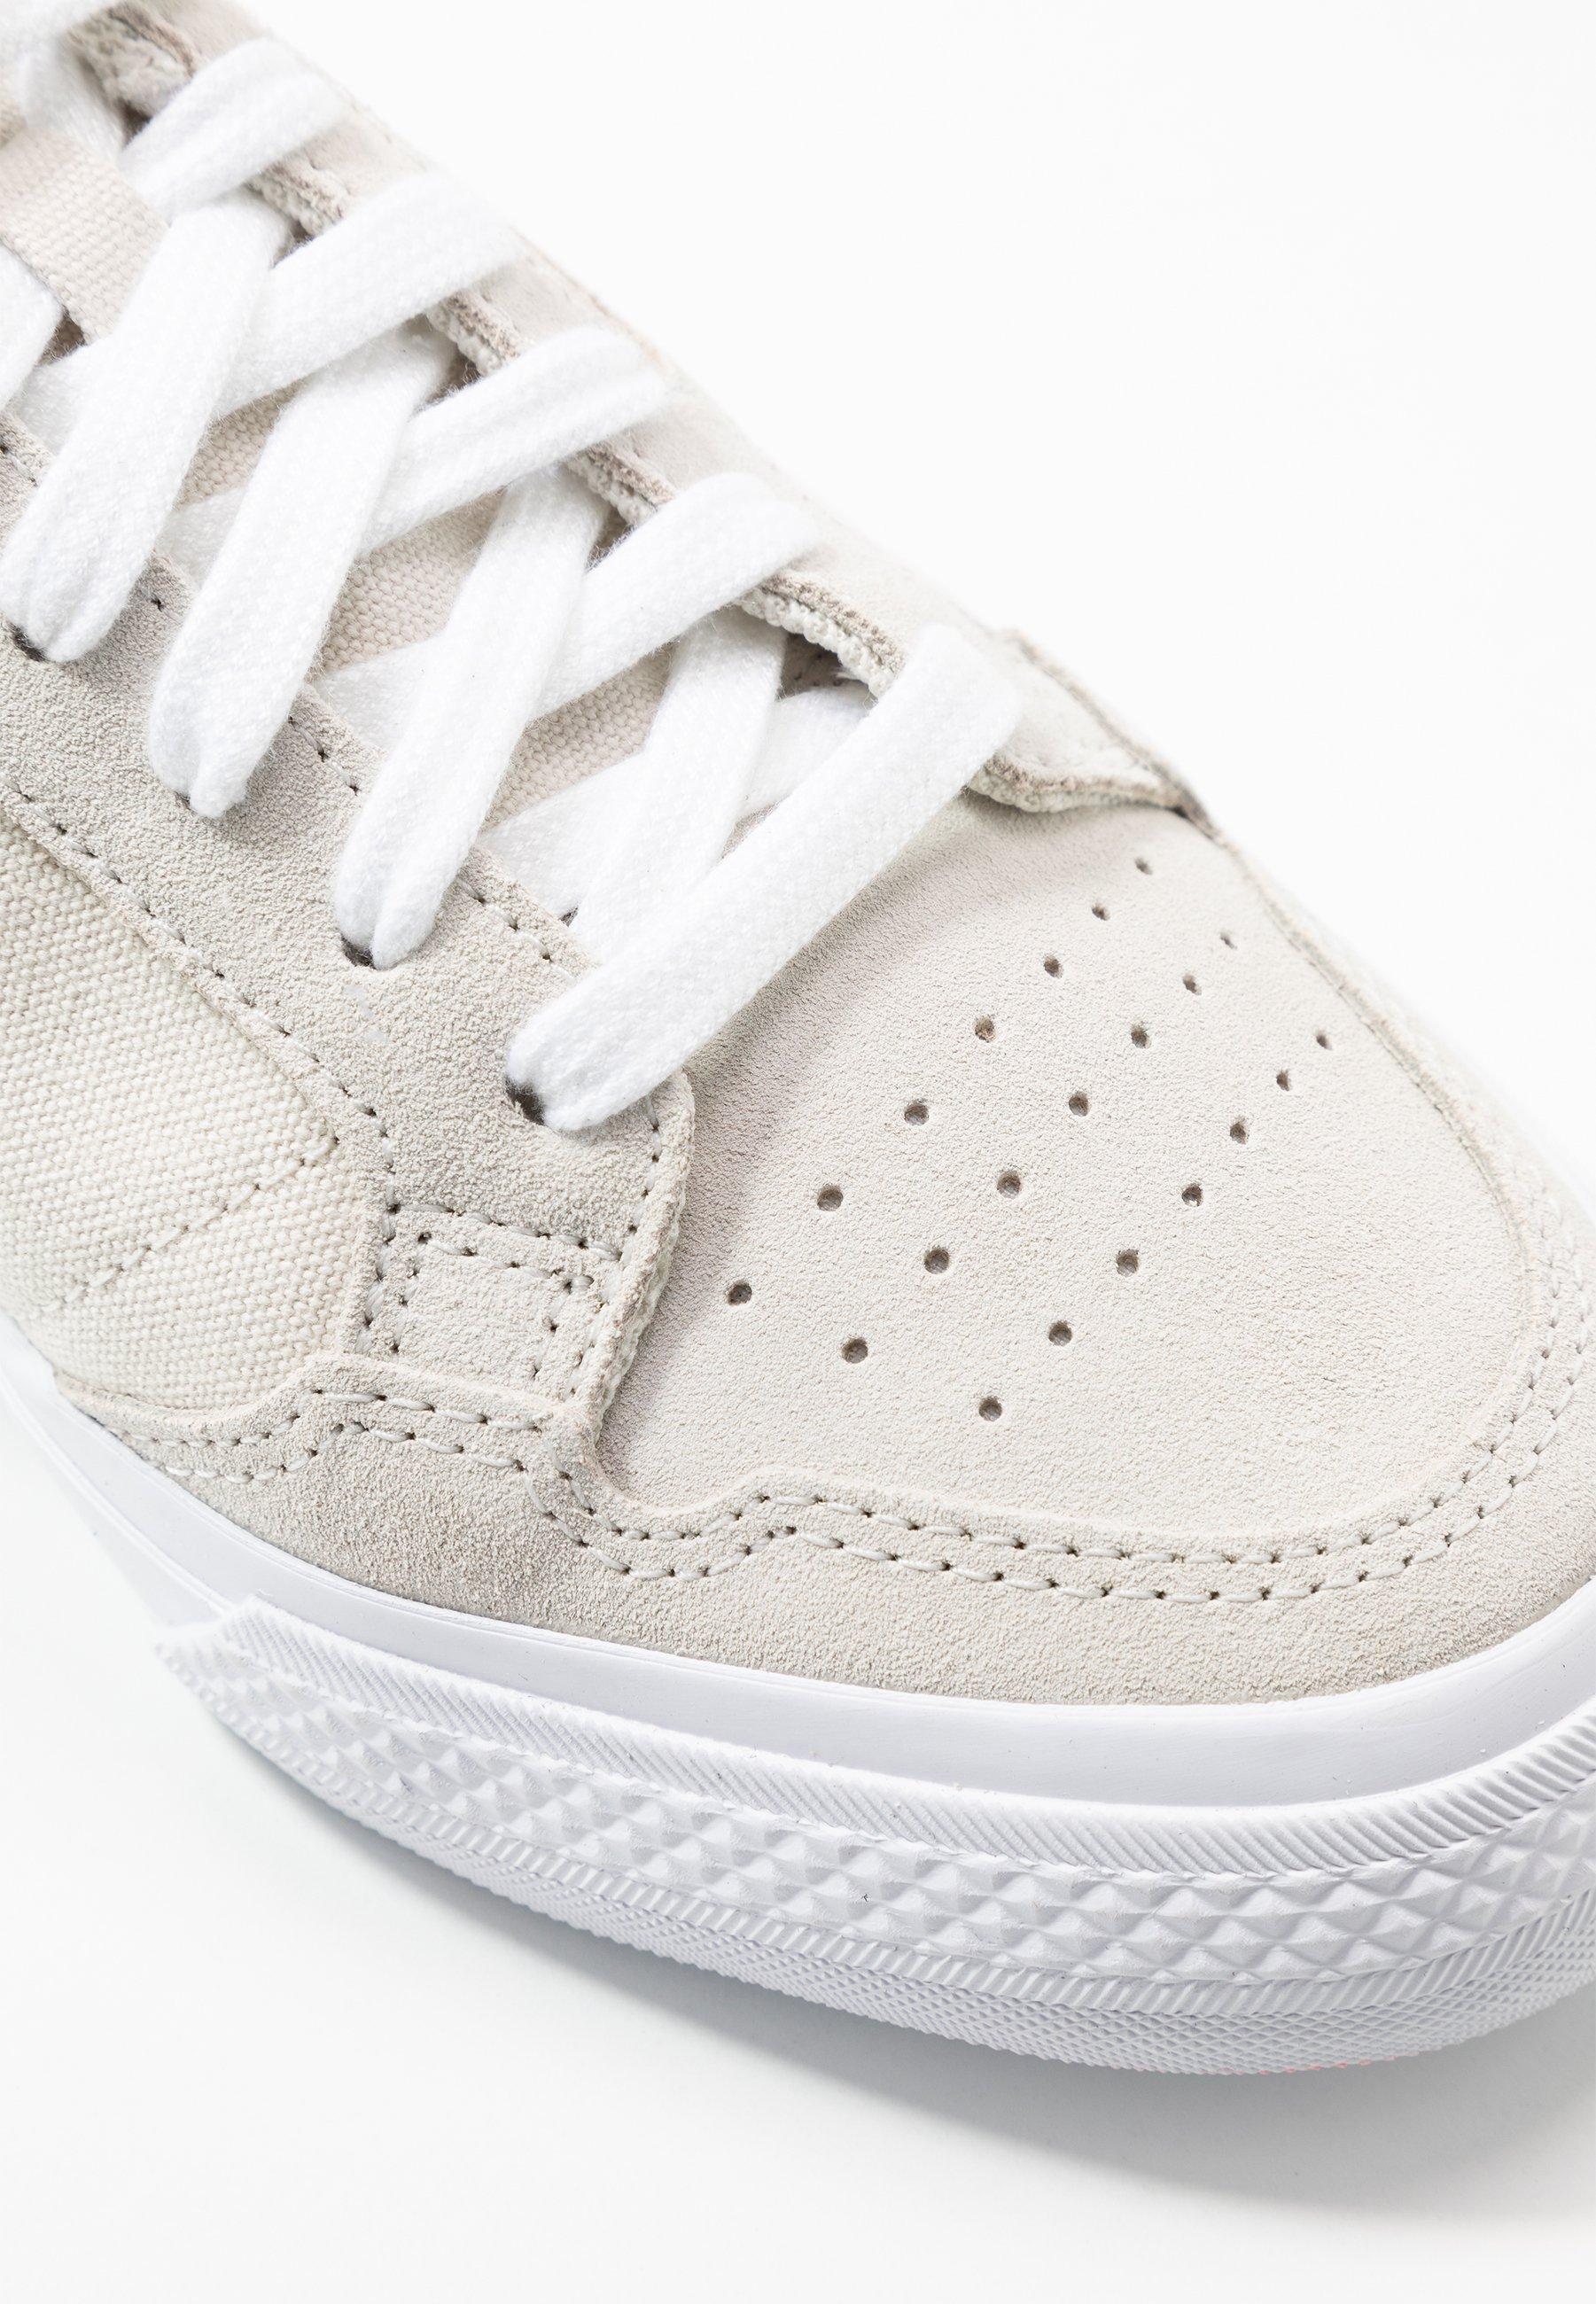 Adidas Originals Continental Vulc - Sneakers Beige